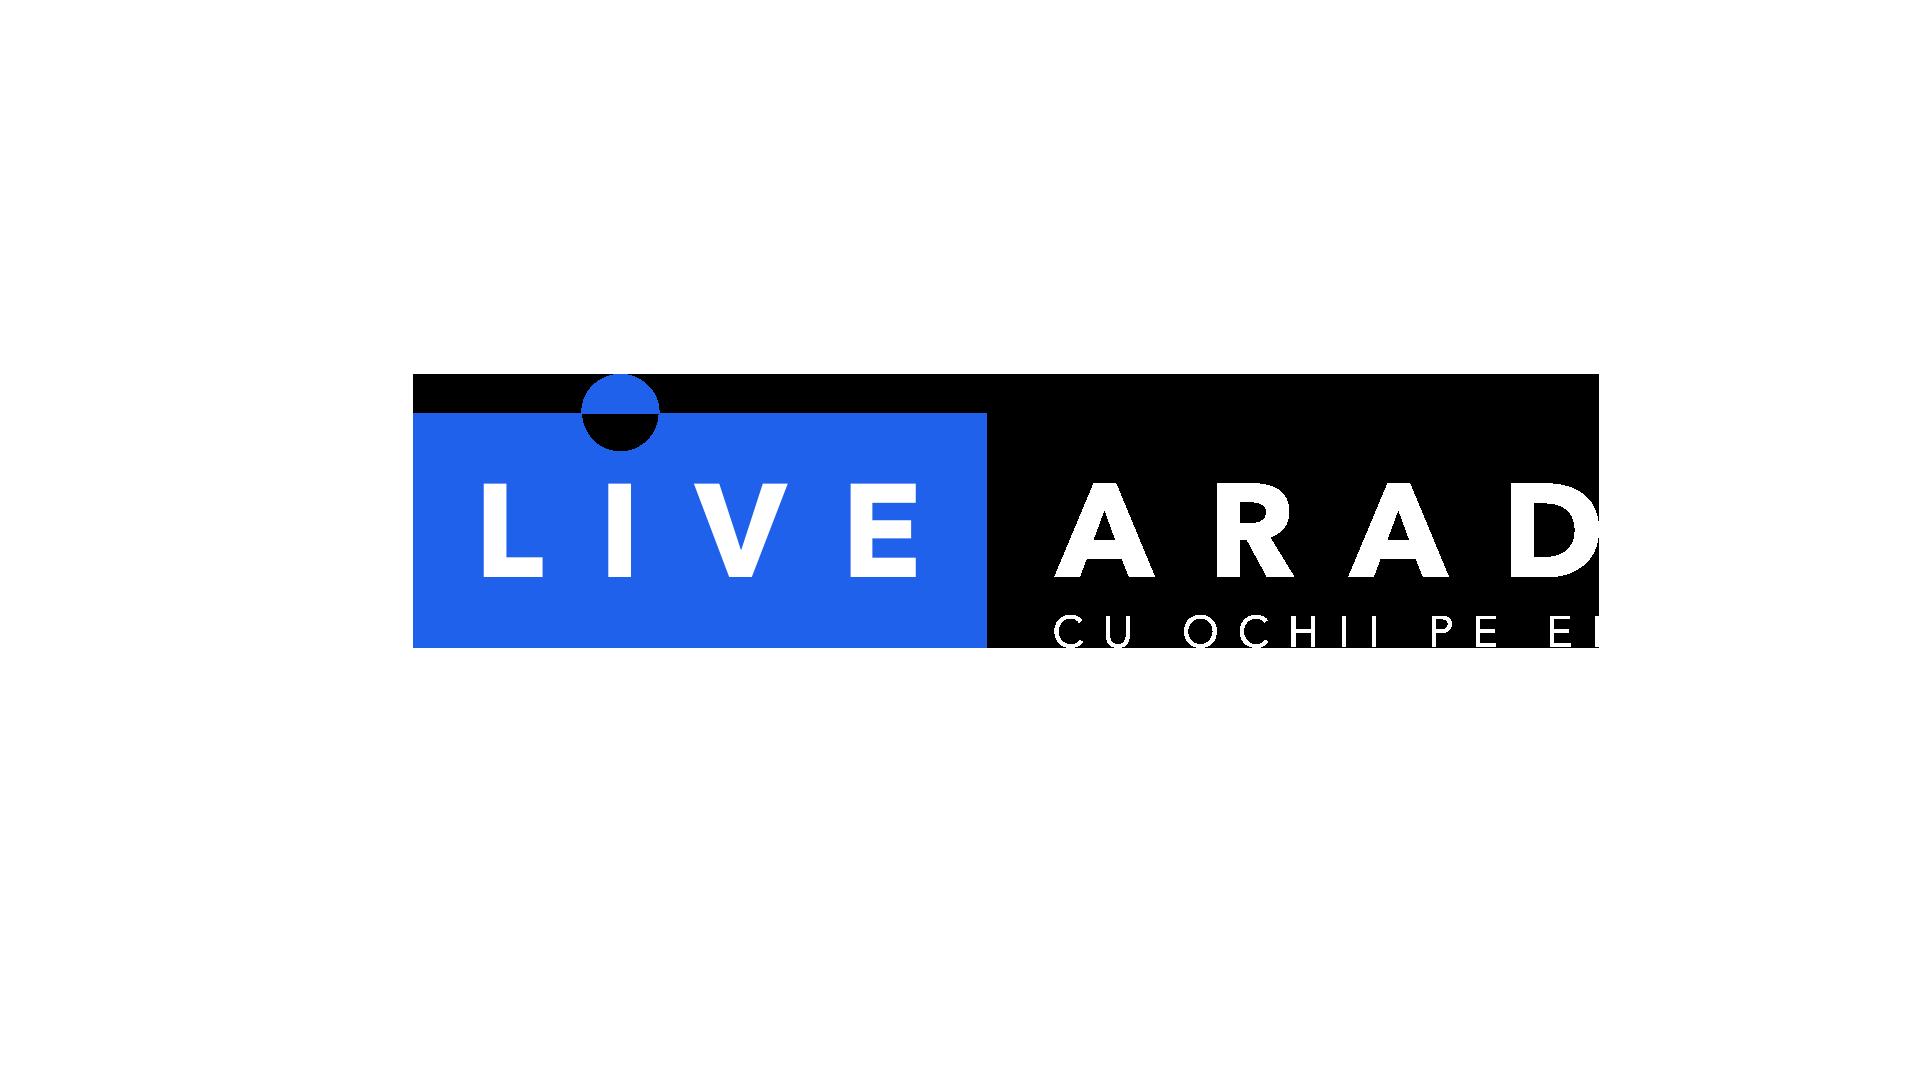 Direct Arad